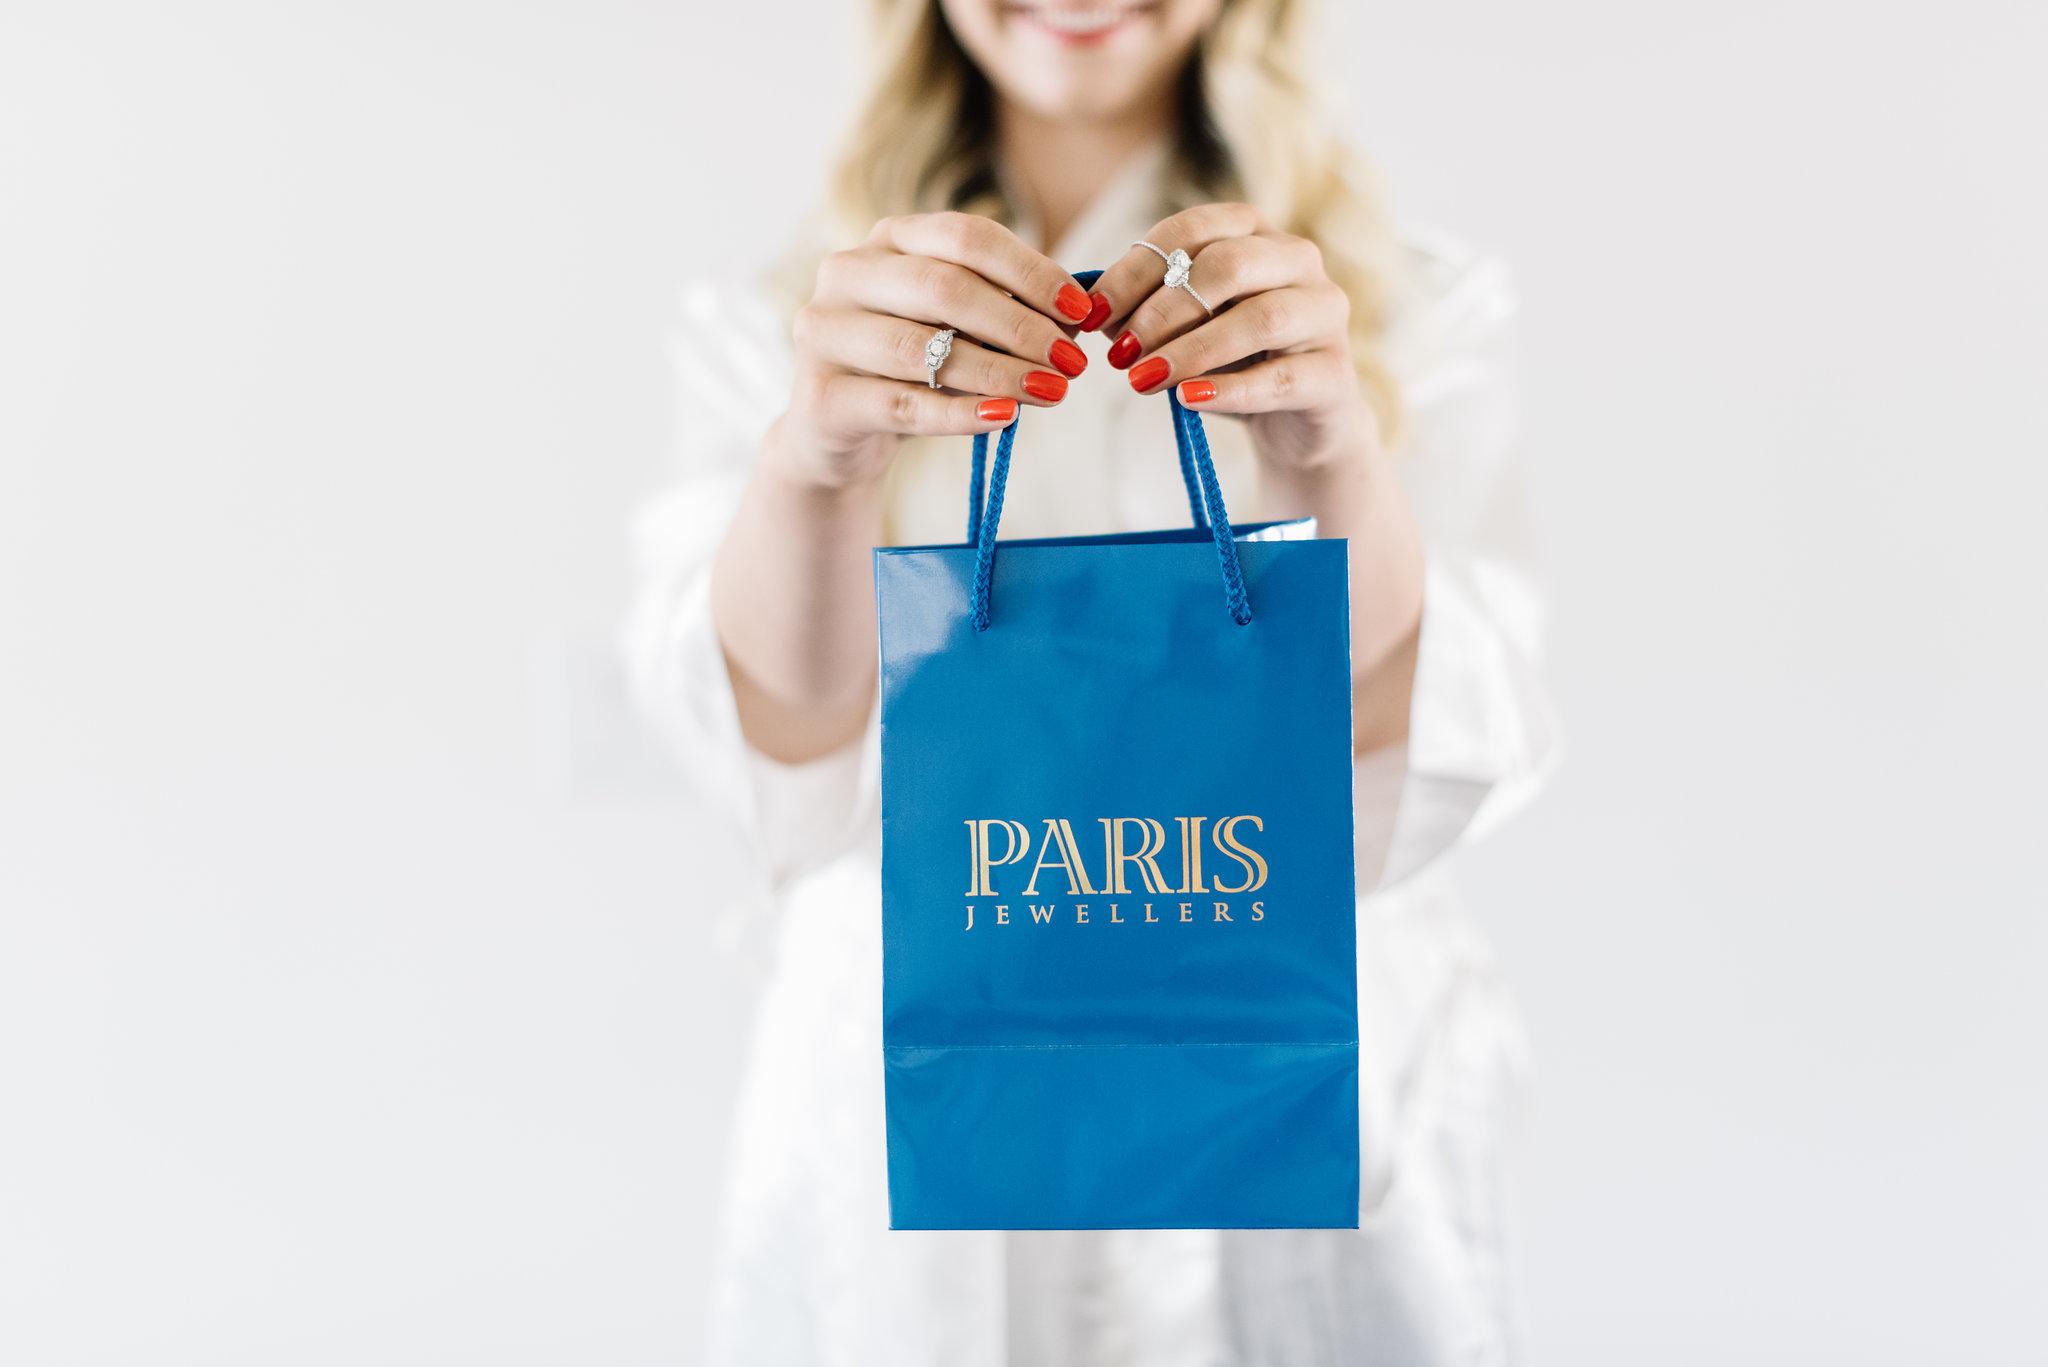 paris jewellers engagement rings